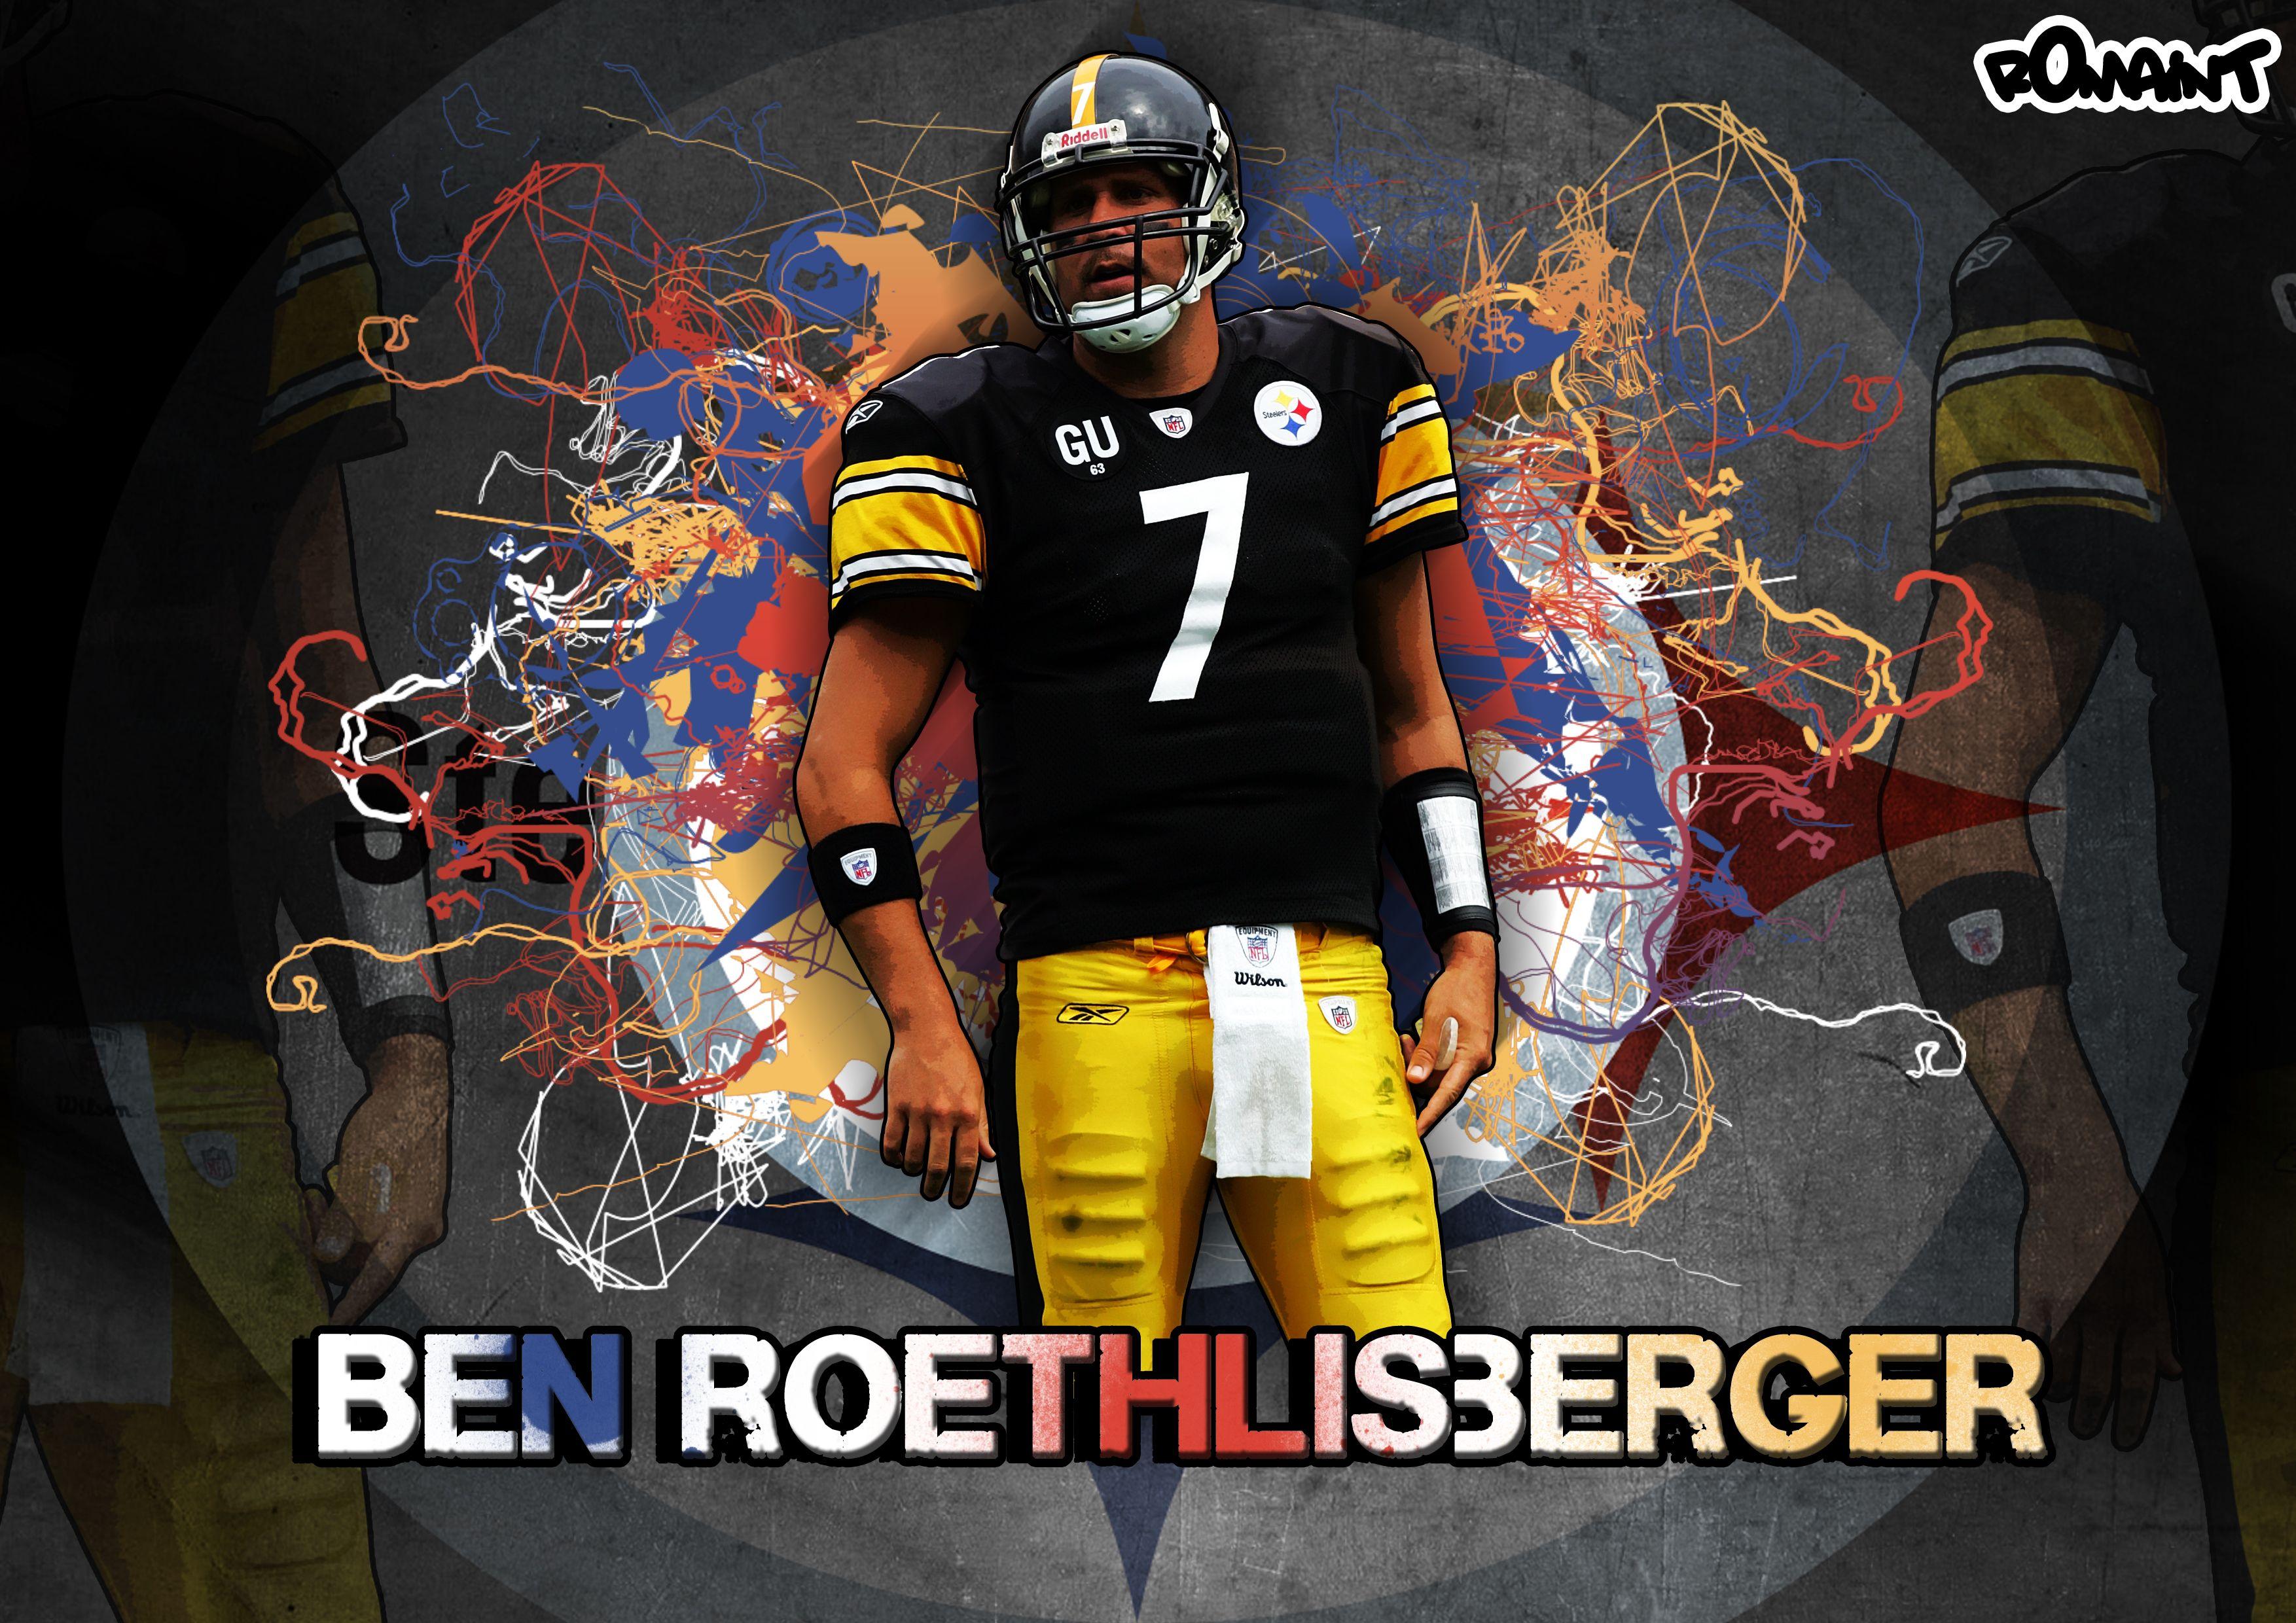 c87979a7339 Ben Roethlisberger Steelers Meme